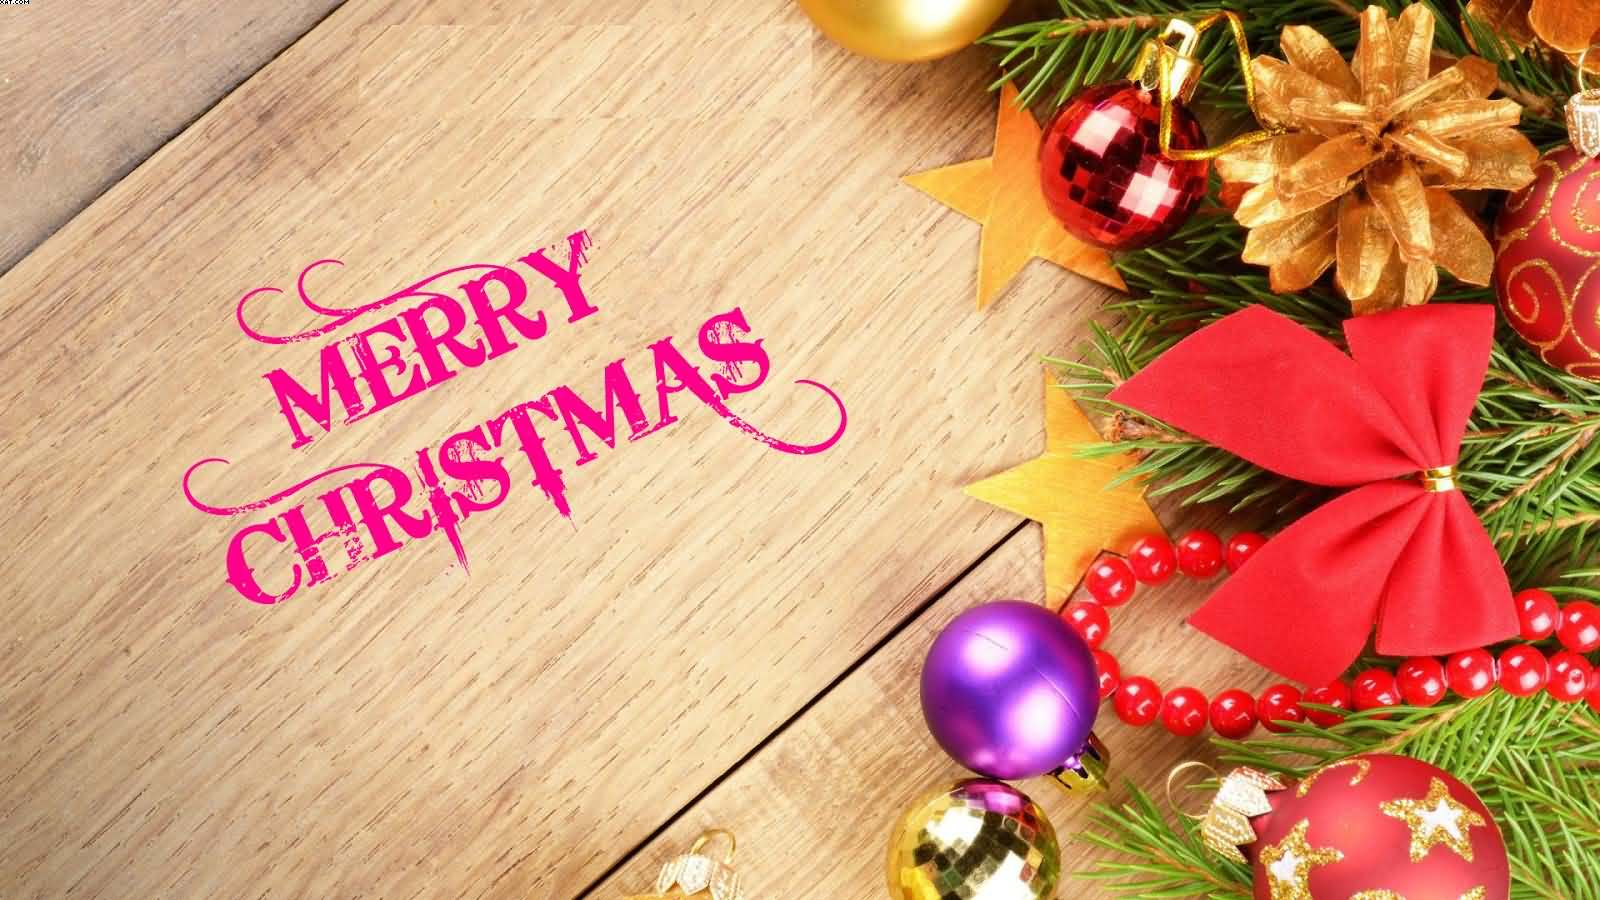 Merry Christmas beautiful stars and balls tree wallpaper